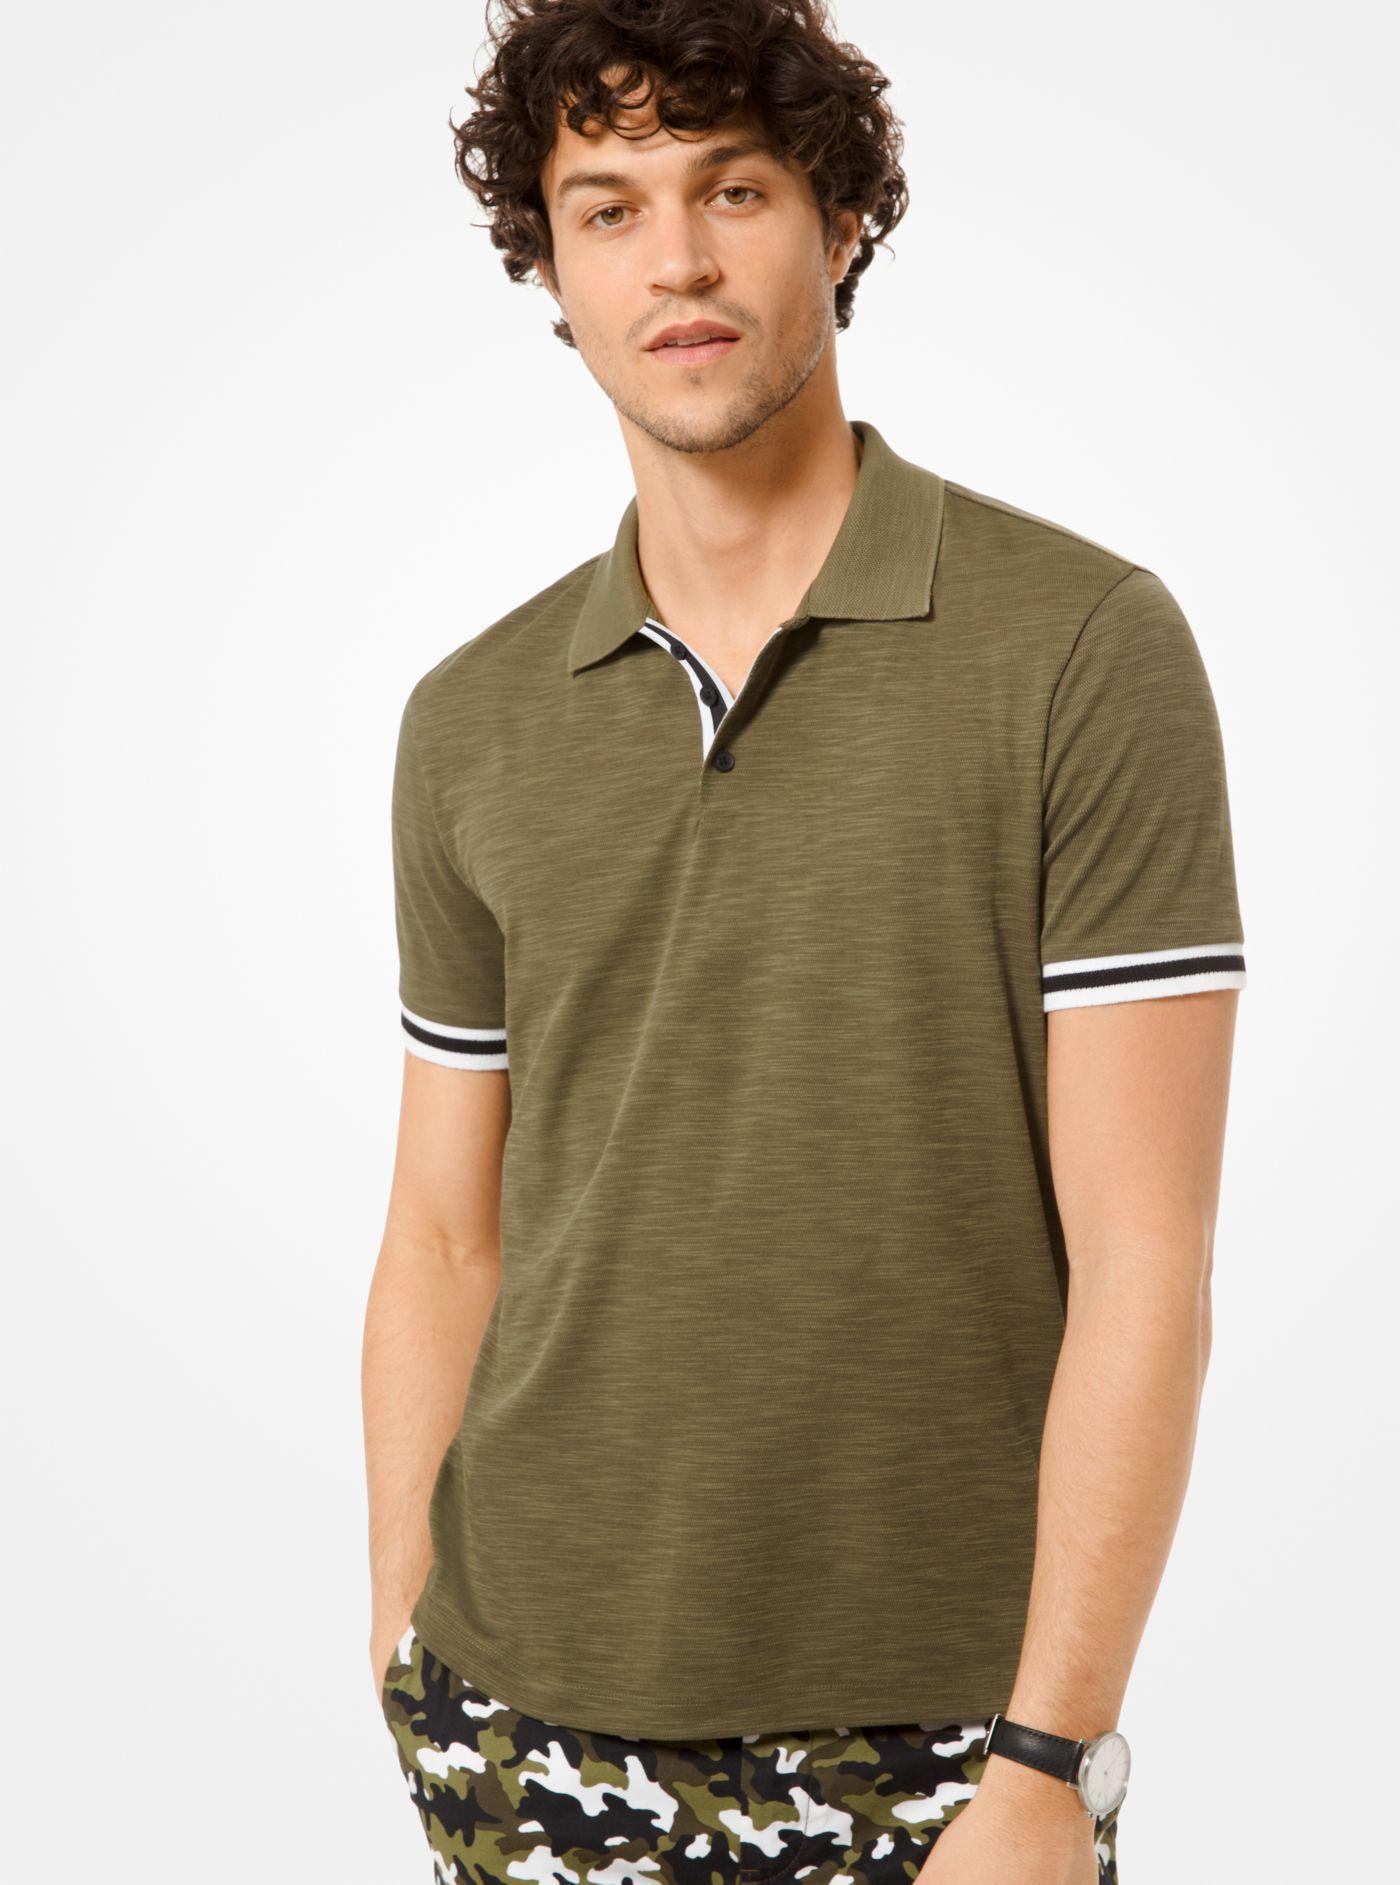 5ff44ec1 Lyst - Michael Kors Cotton Piqué Polo Shirt in Green for Men